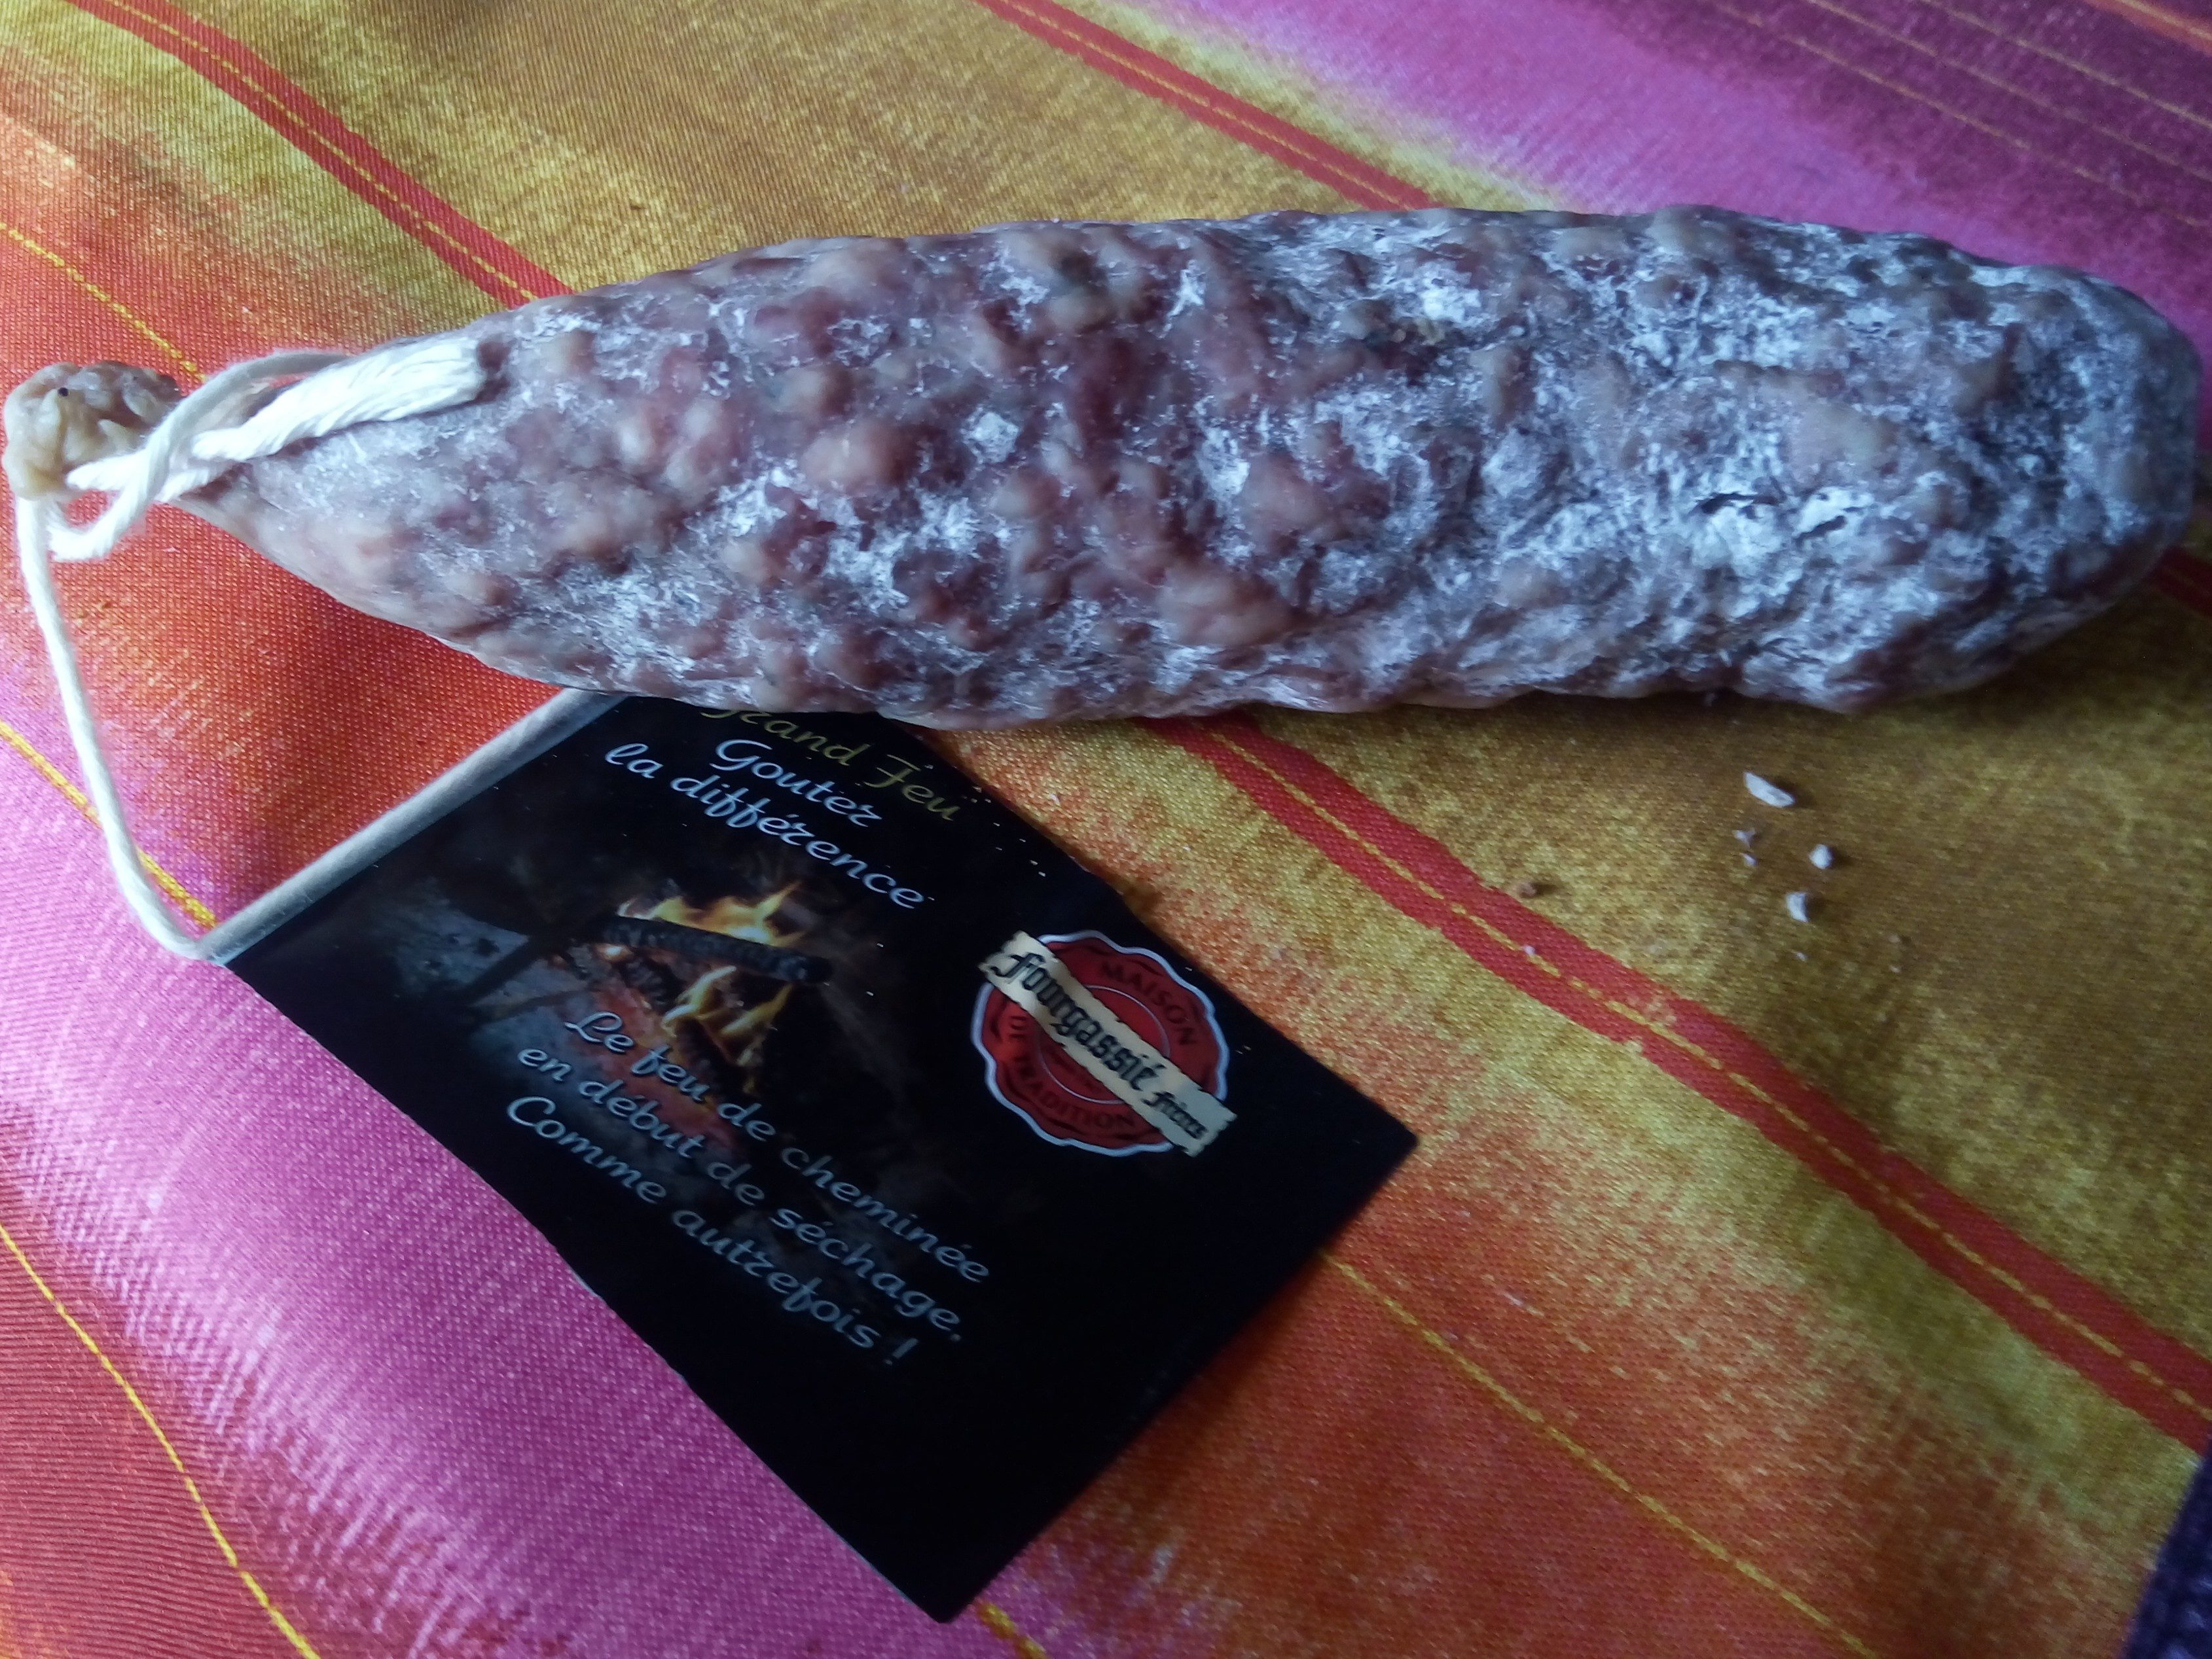 Saucisson sec grand feu - Produit